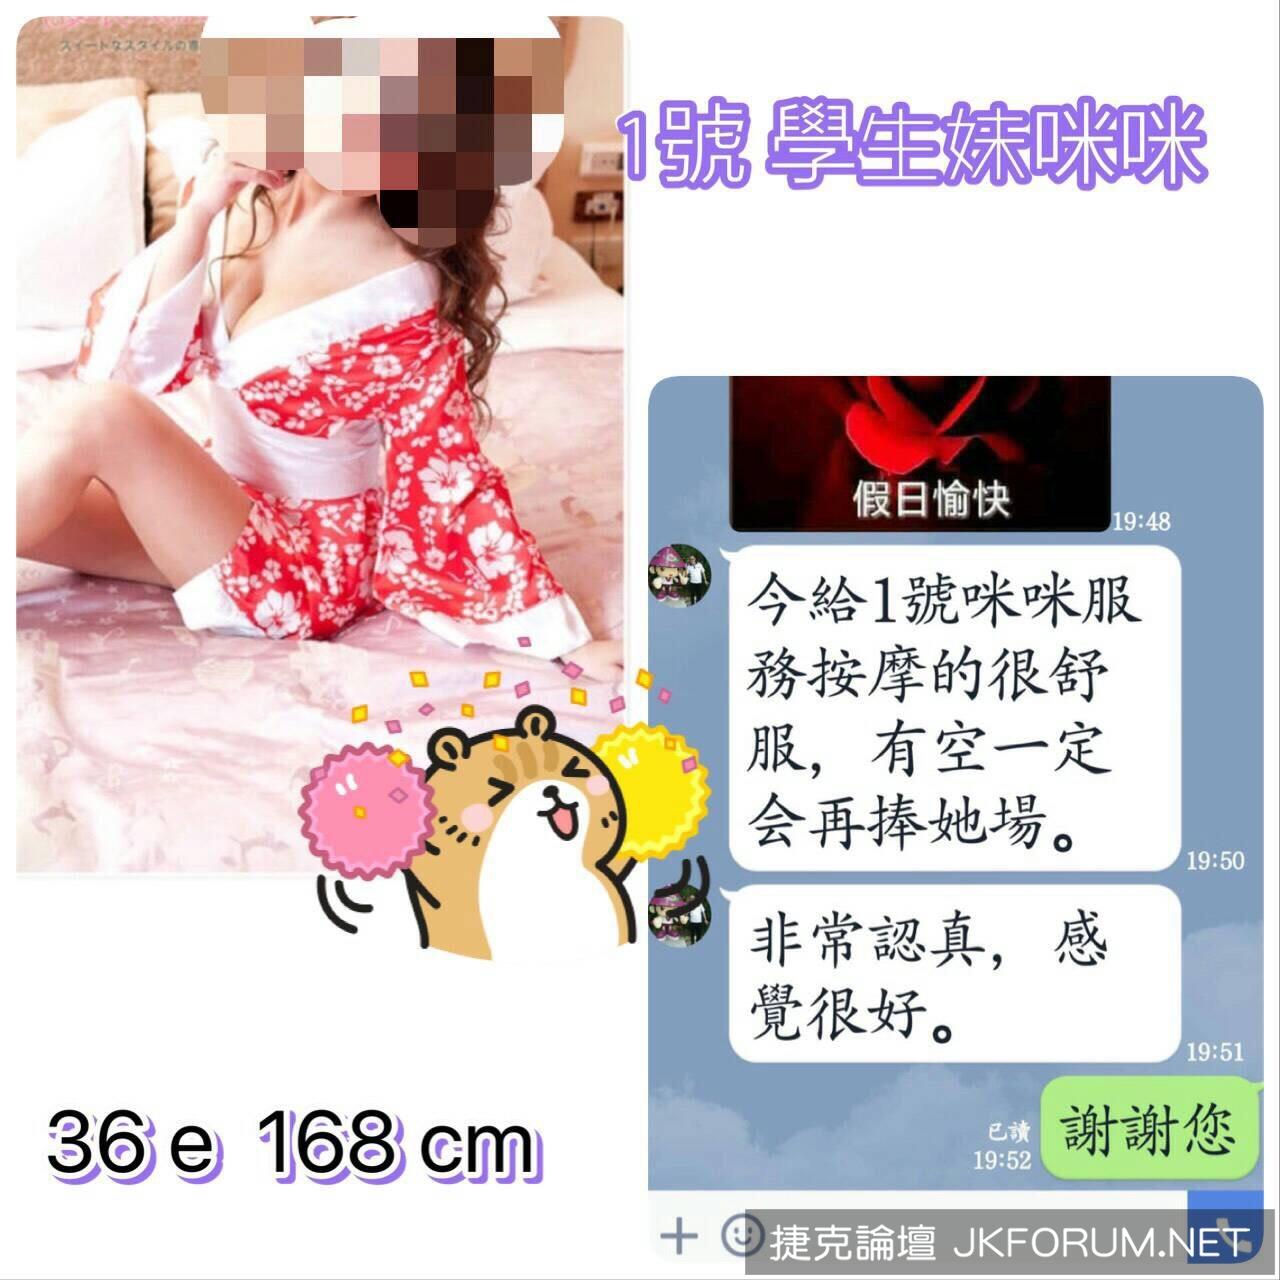 S__901143.jpg